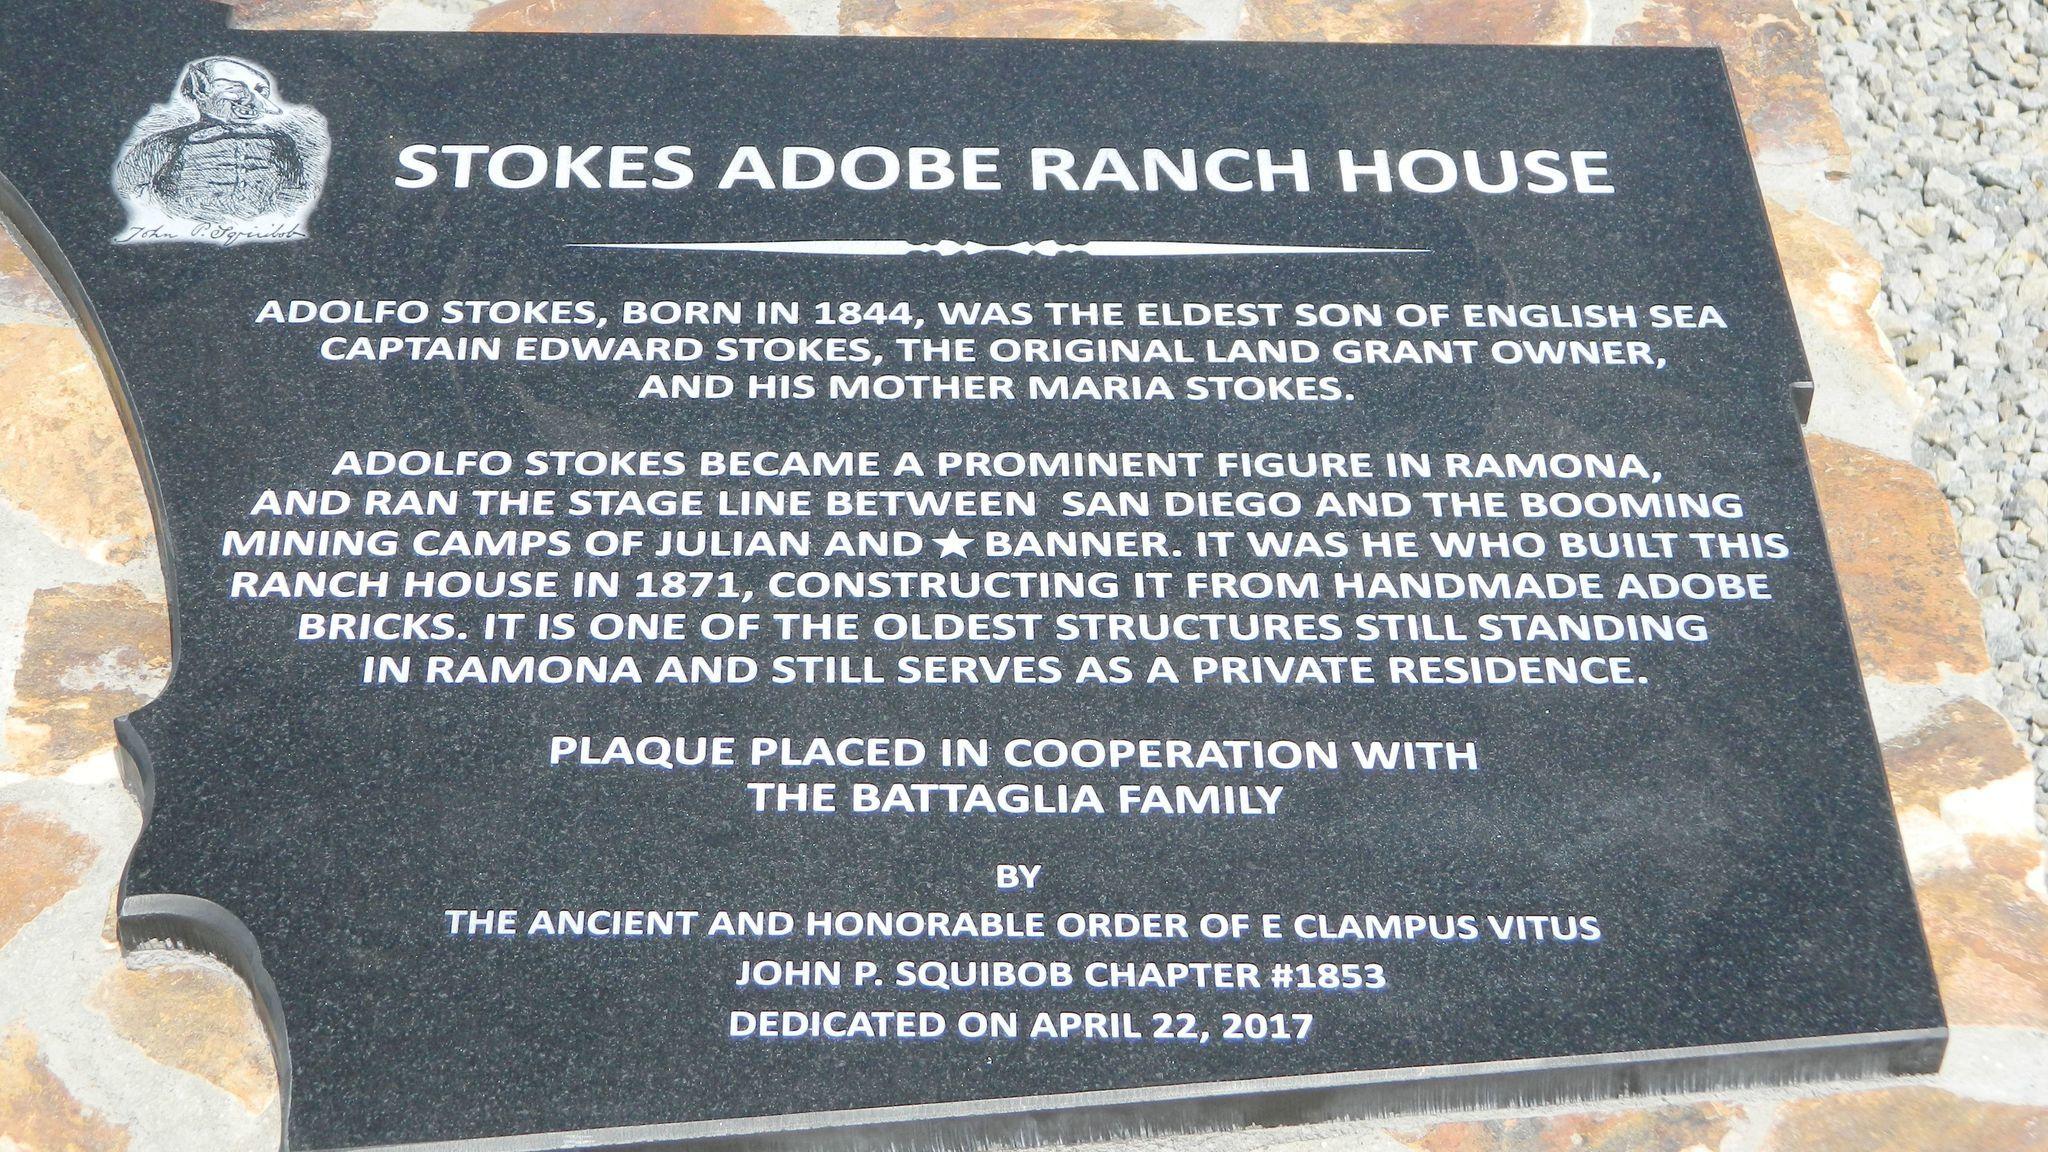 The Stokes Adobe Ranch House plaque.